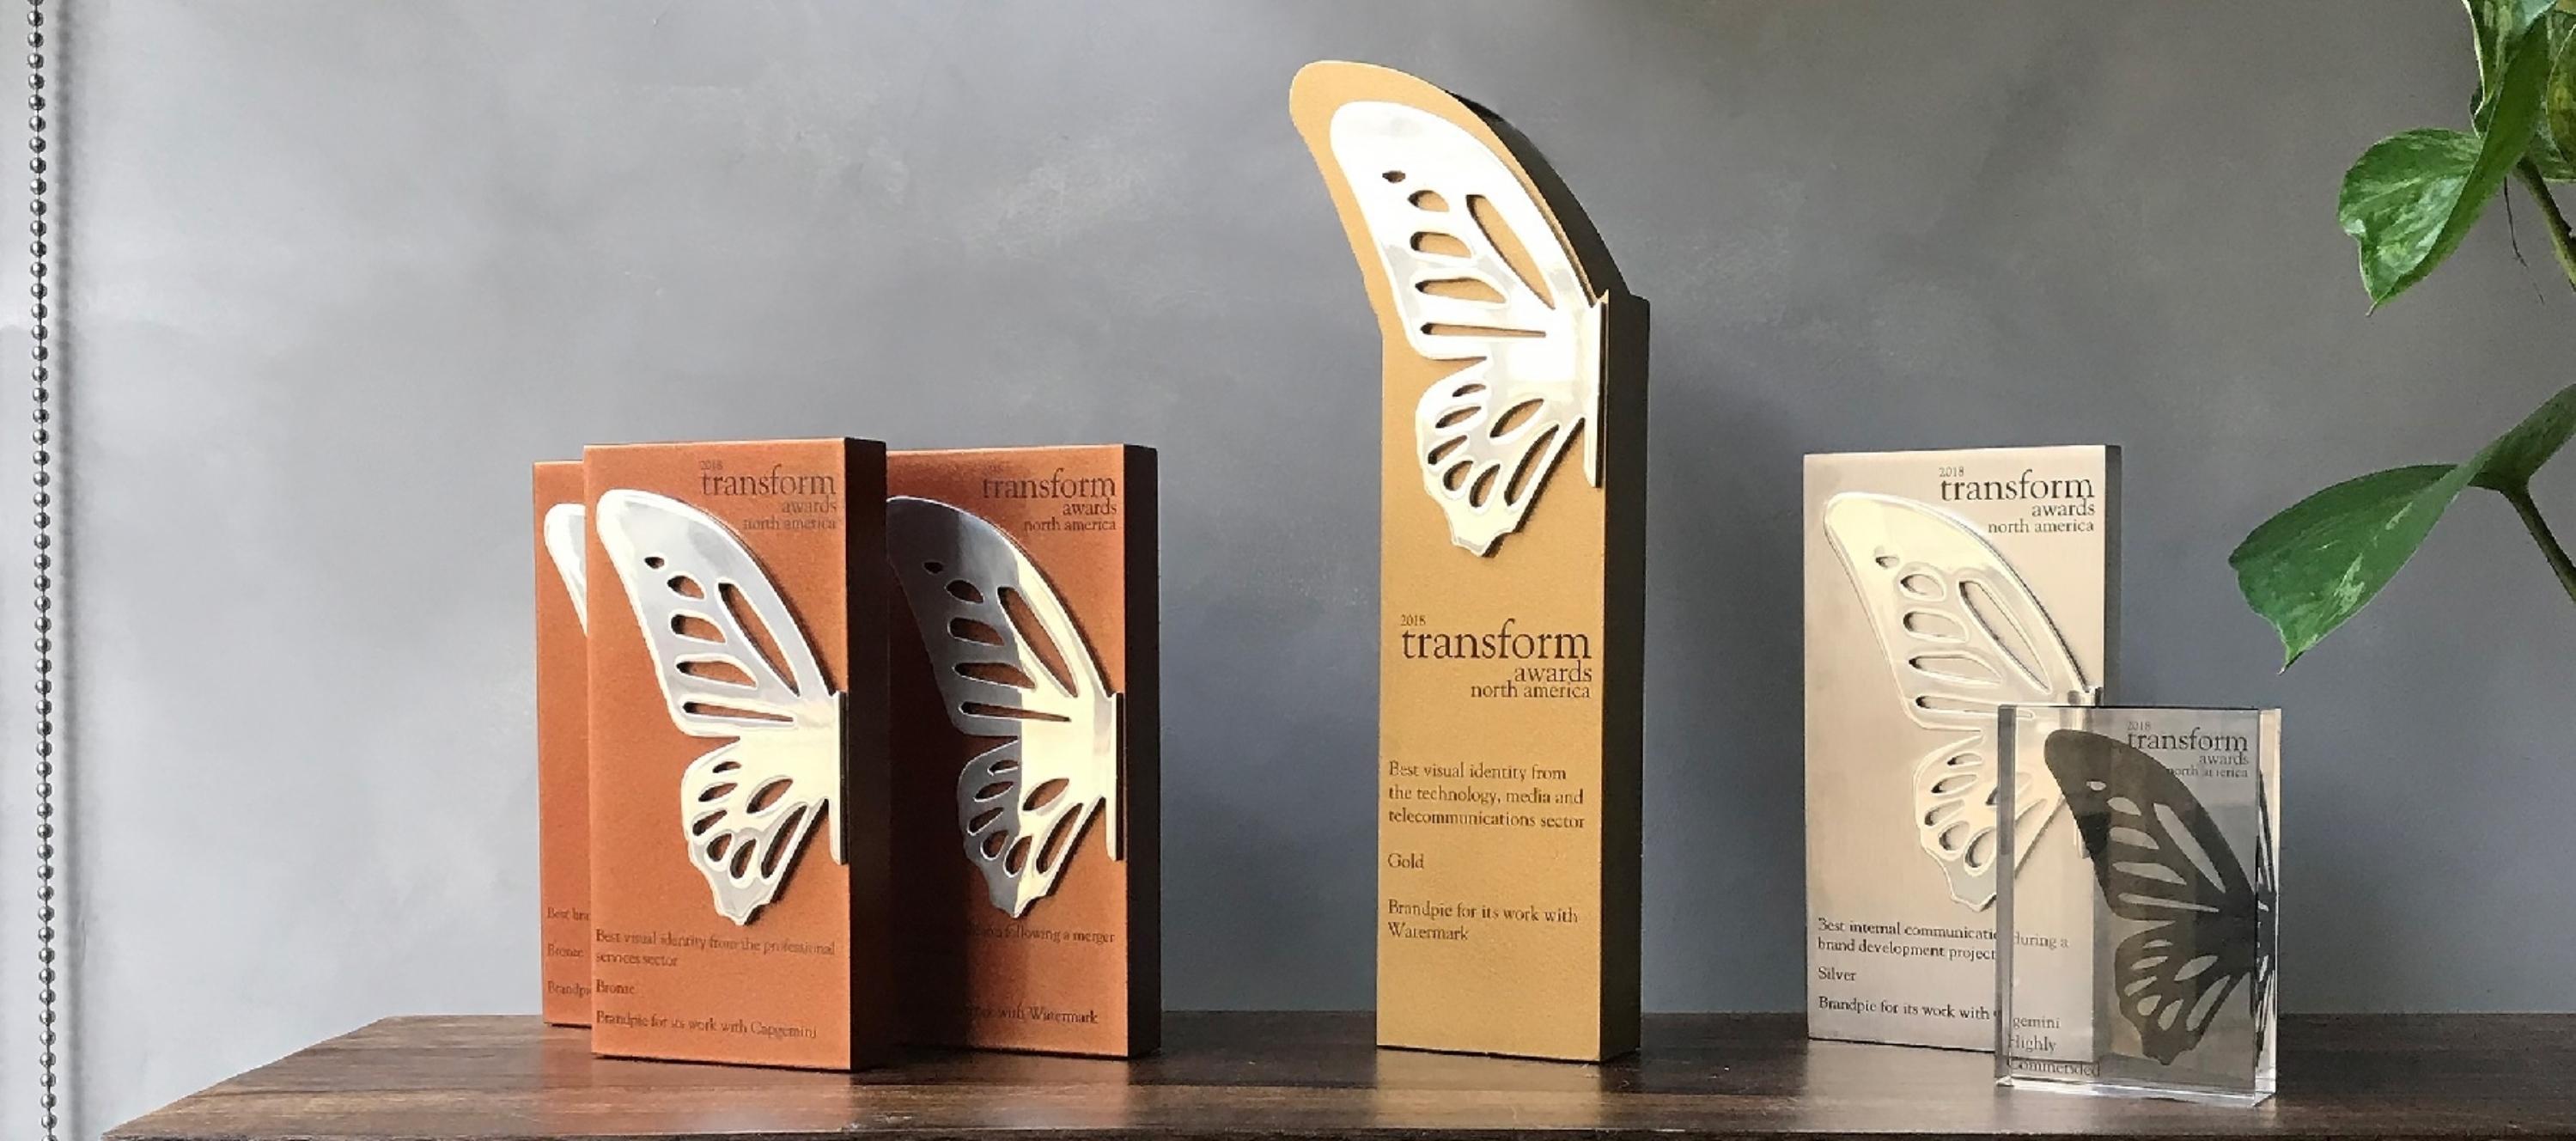 Transform-Awards-NA-2018-01